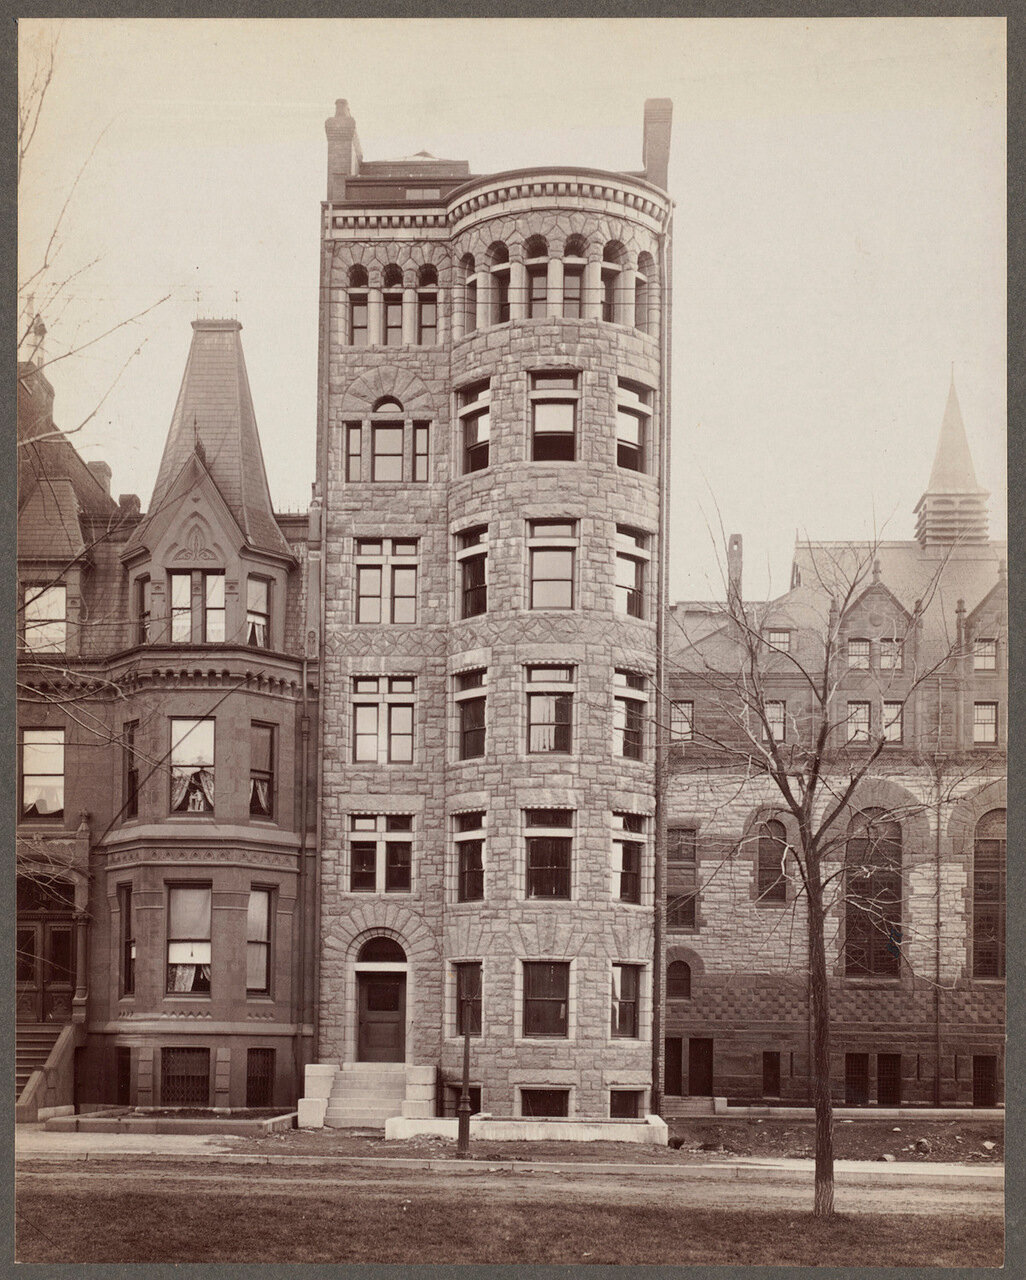 1889 - 1890